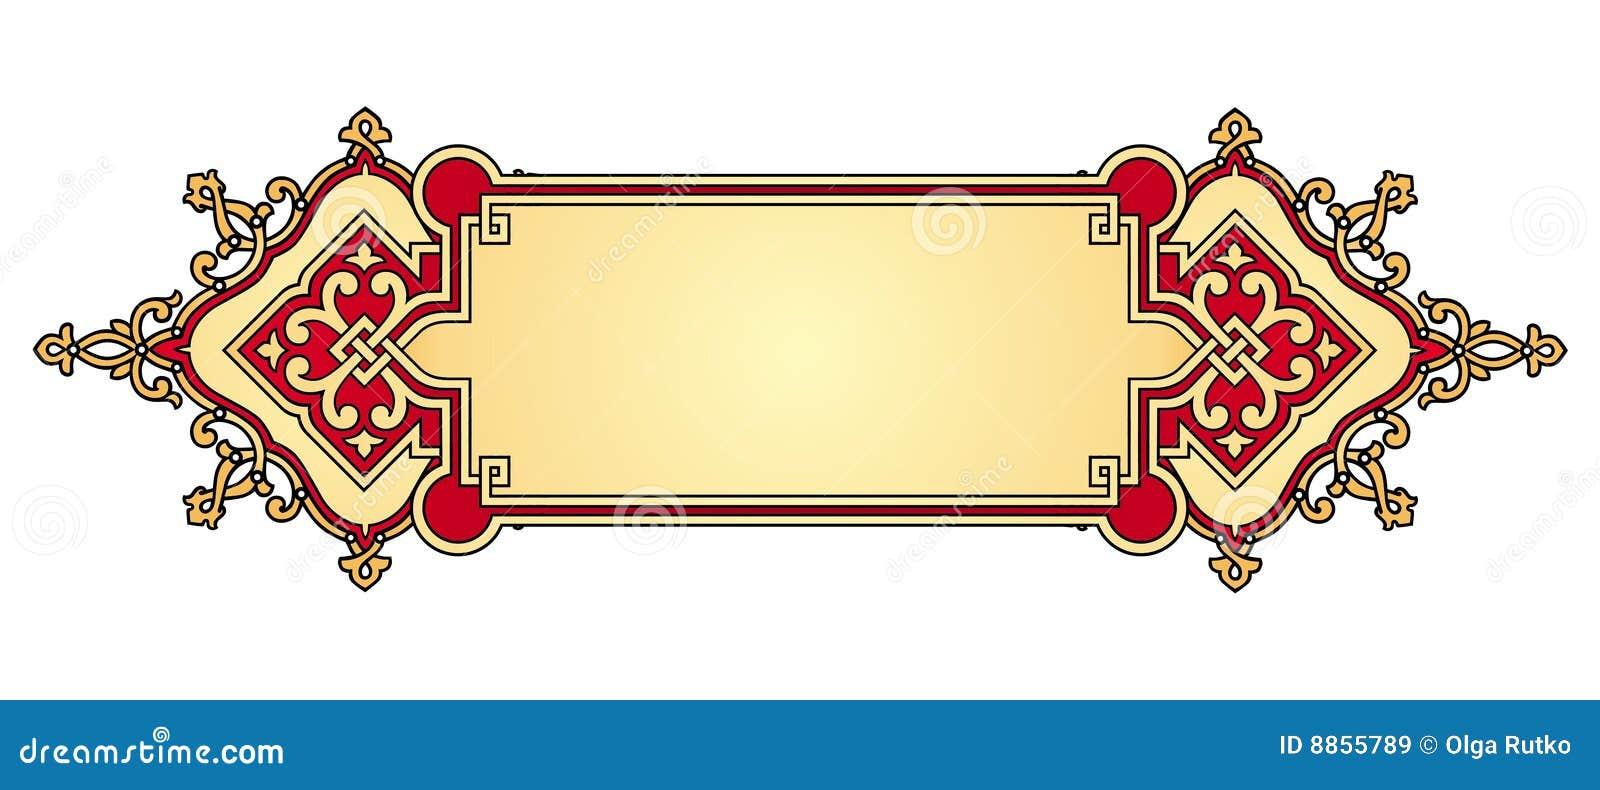 Banner Scroll Design Template